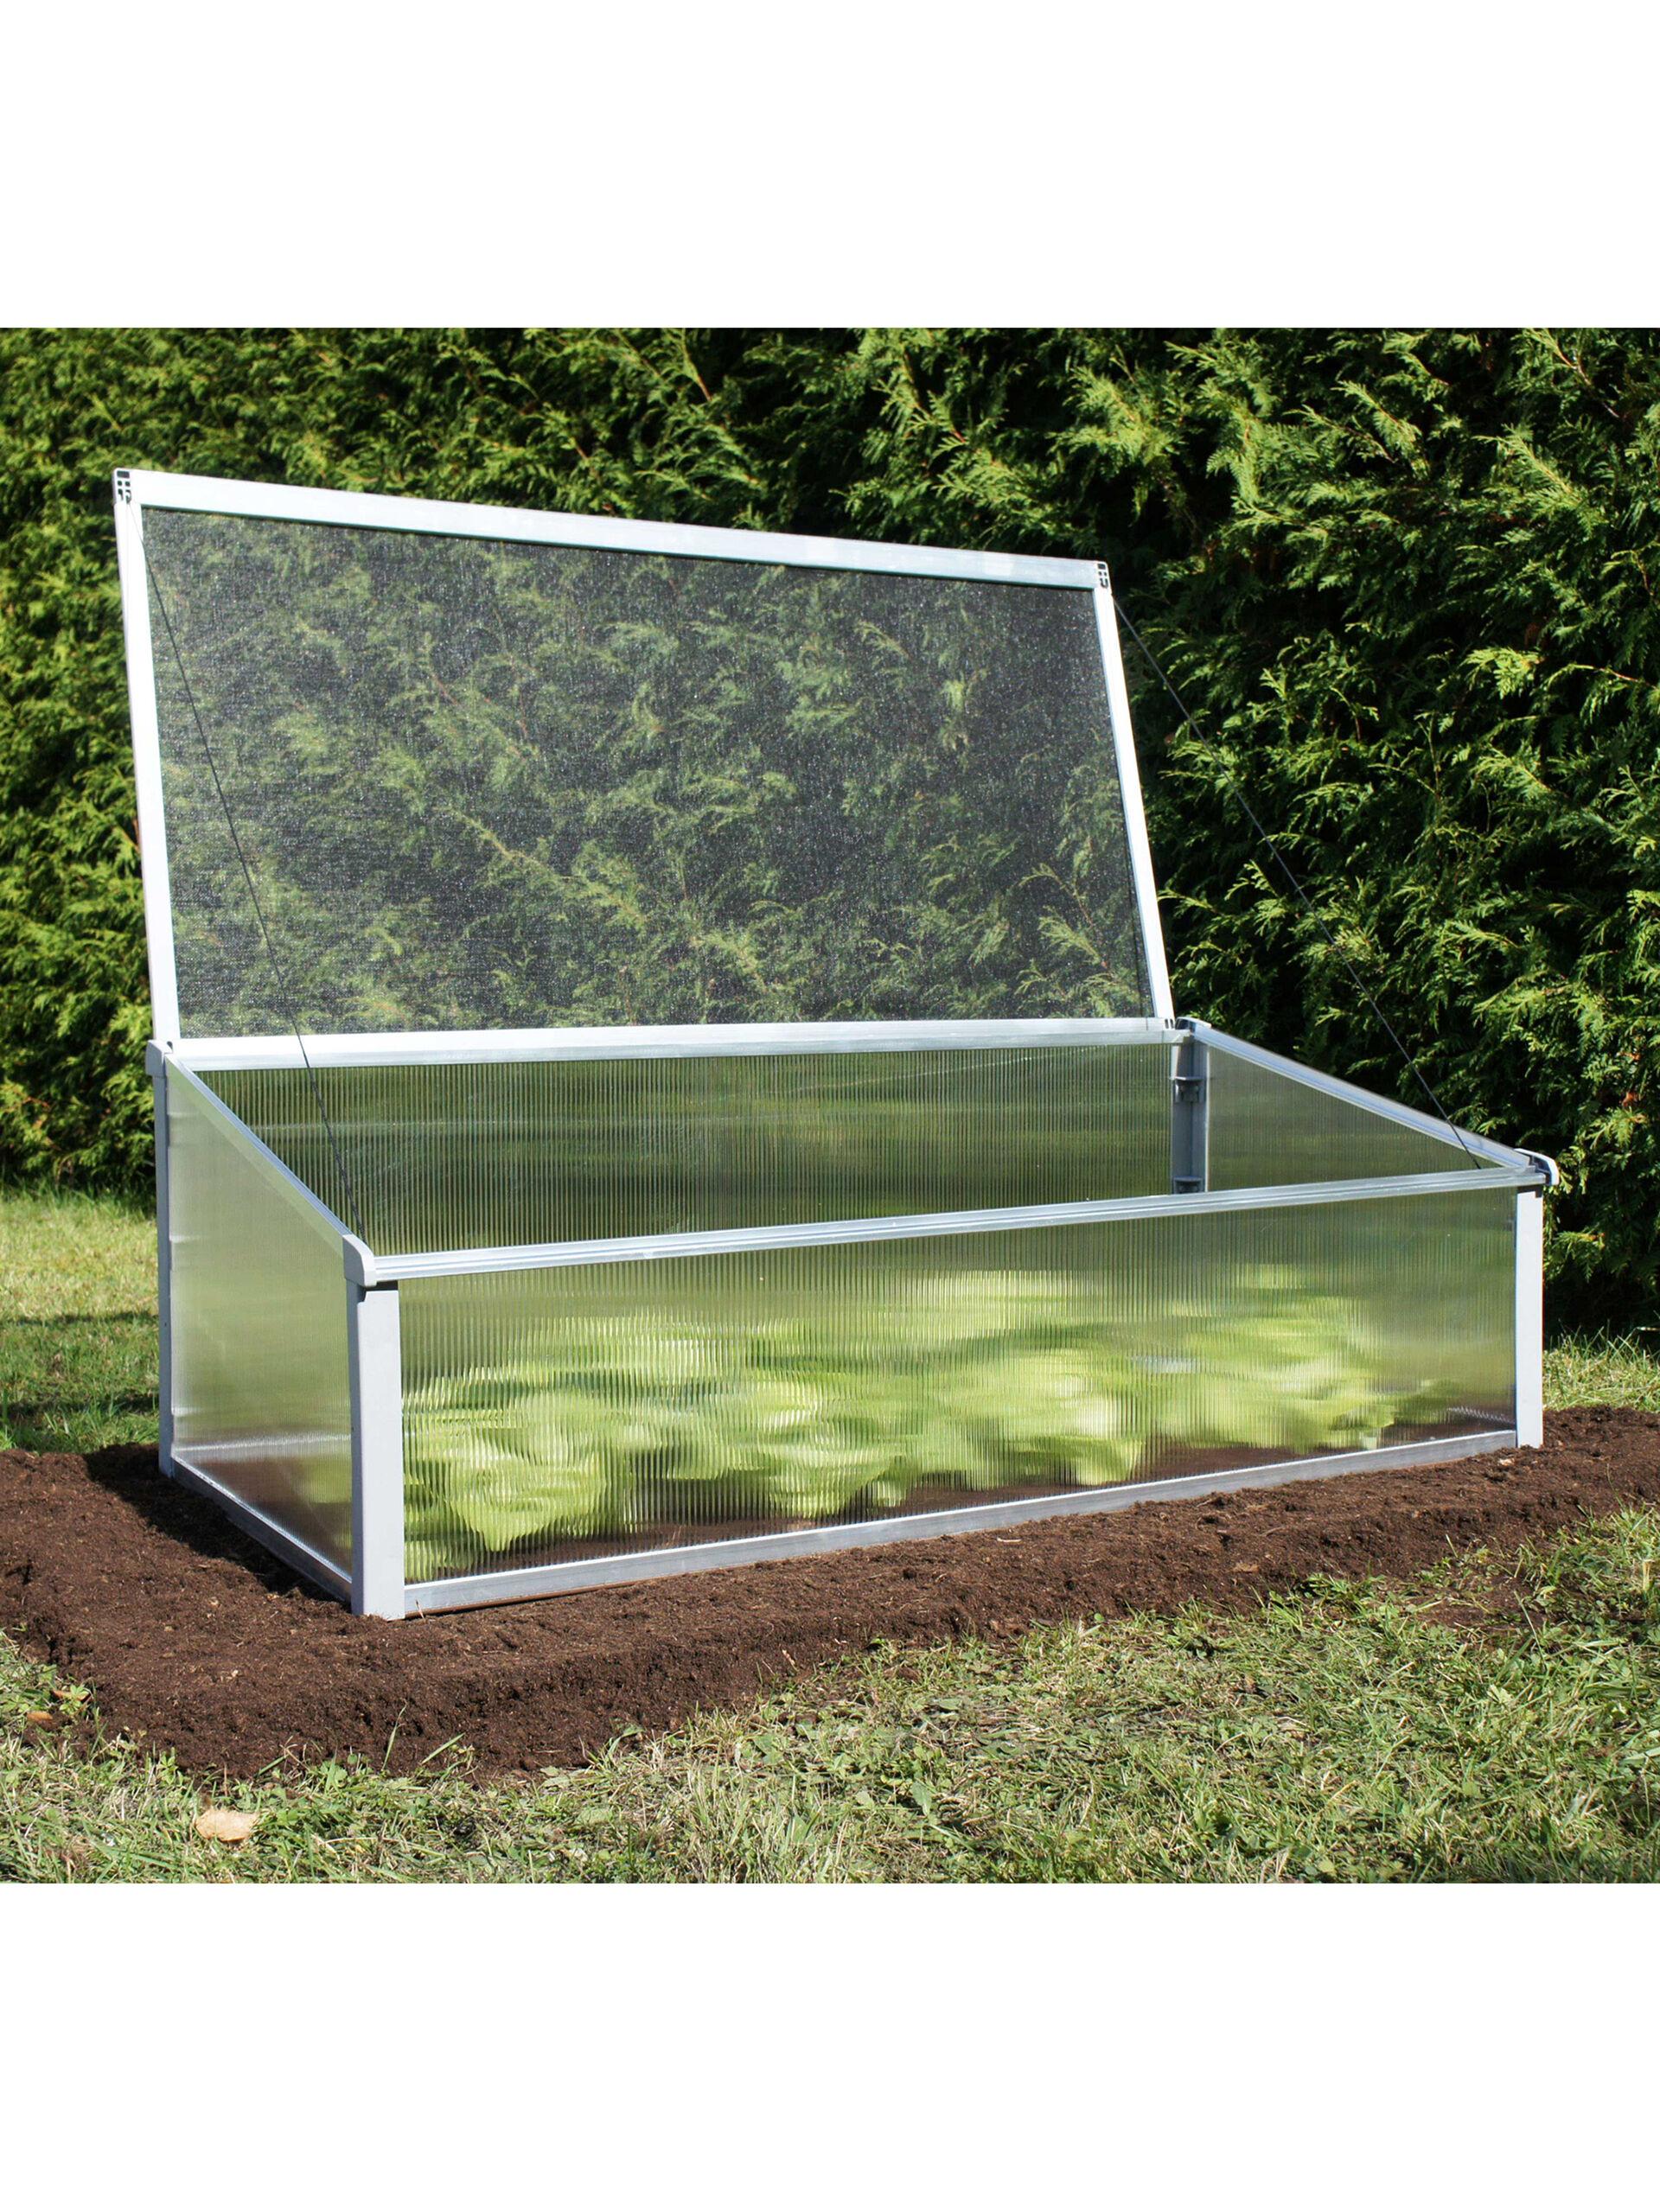 Vegtrug elevated garden beds elevated raised garden beds for Outdoor kitchen kits for sale